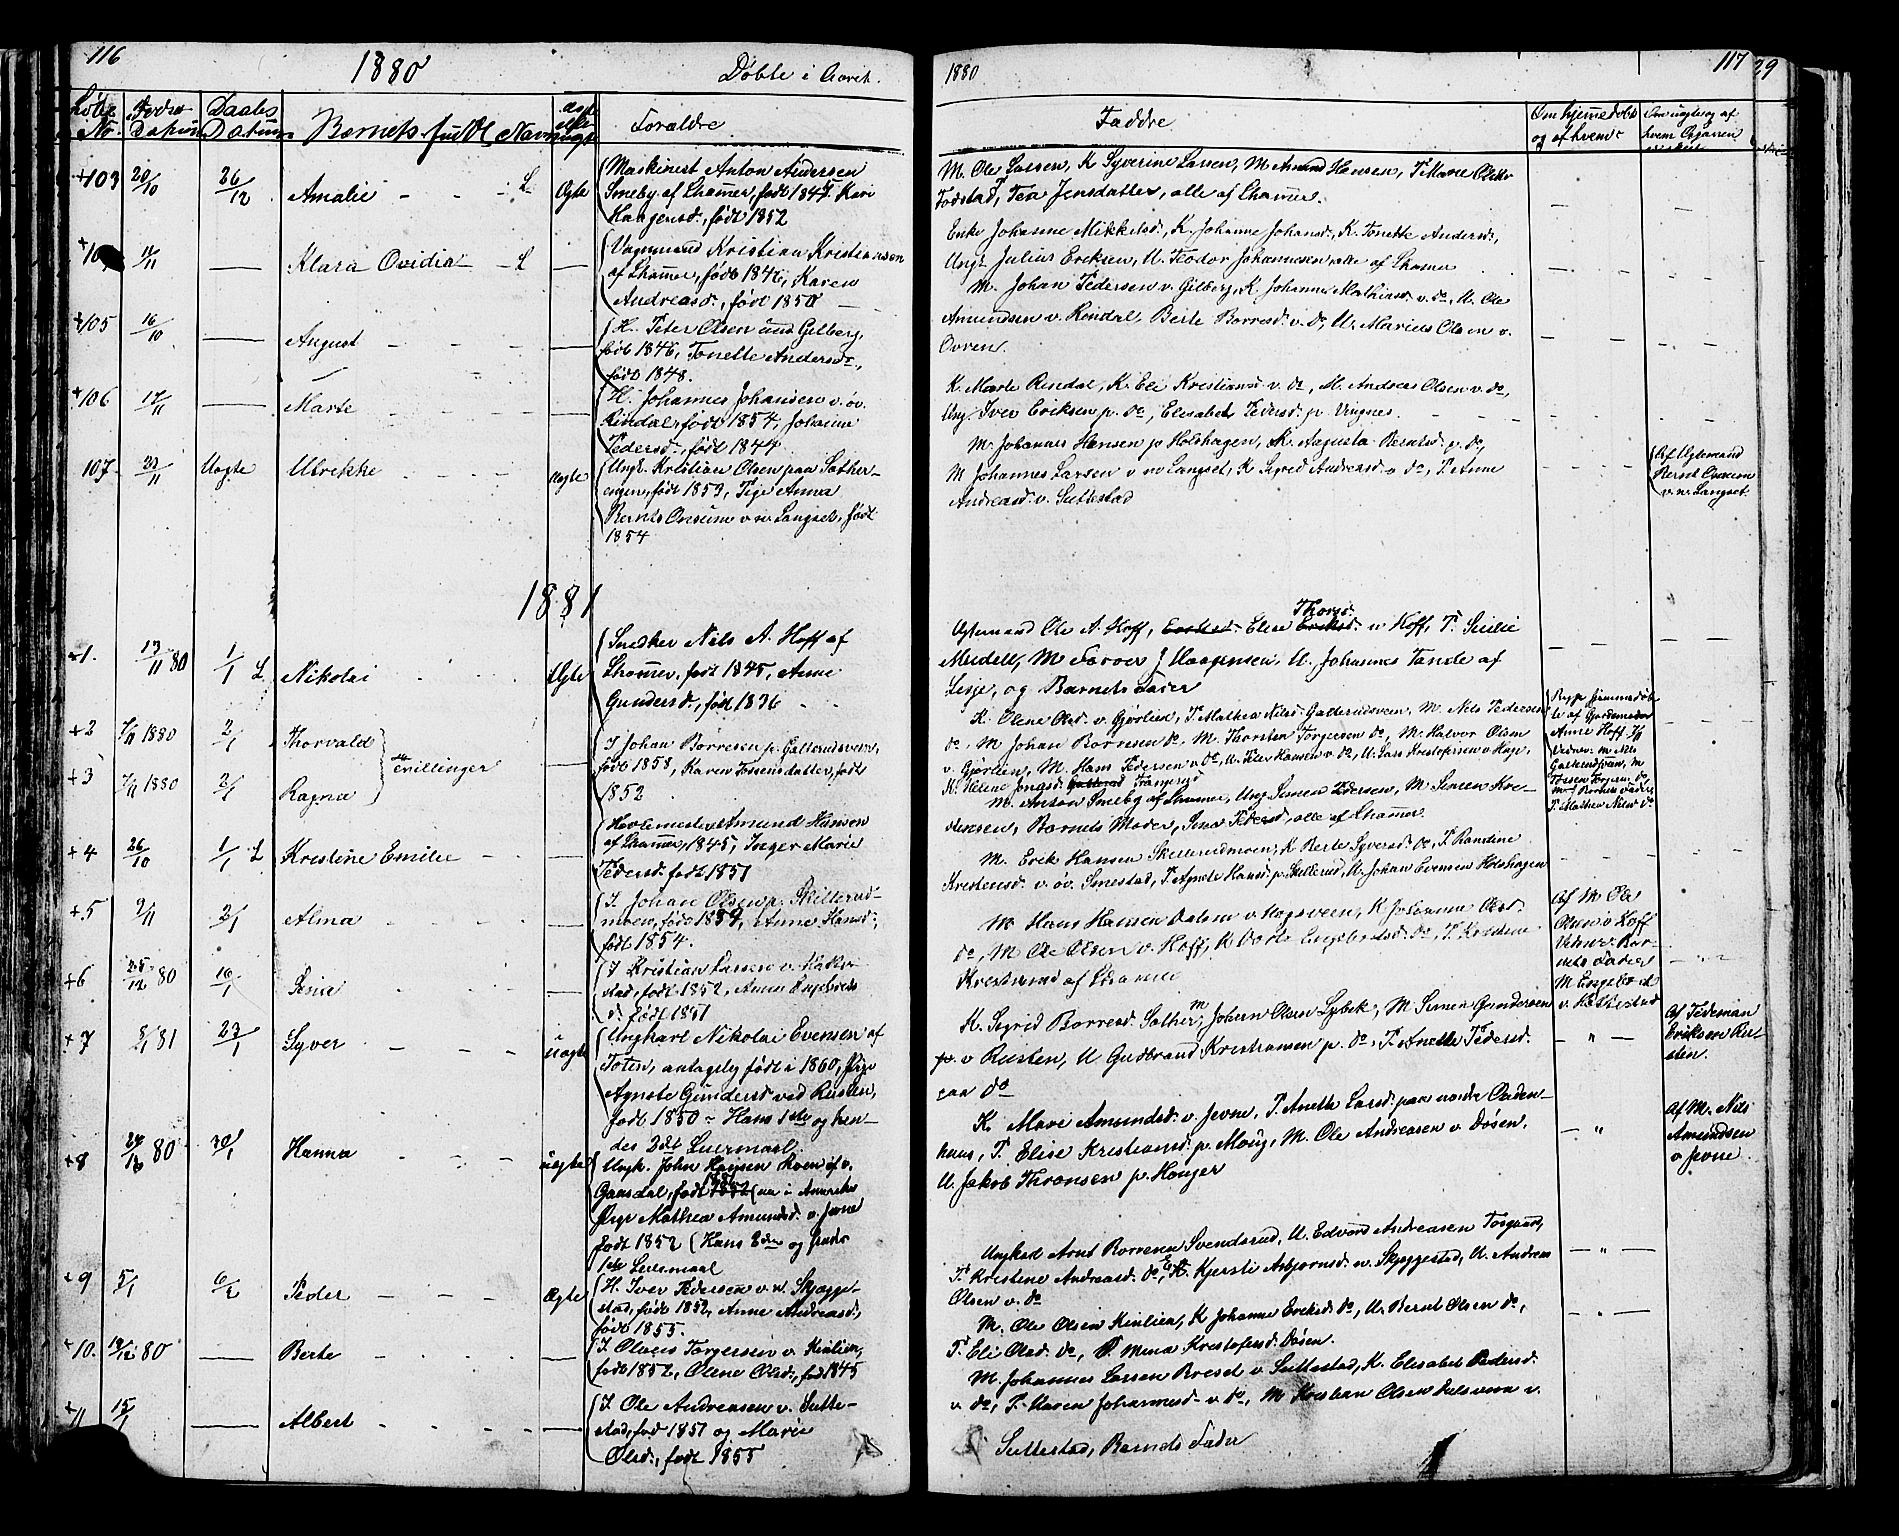 SAH, Fåberg prestekontor, Klokkerbok nr. 7, 1856-1891, s. 116-117